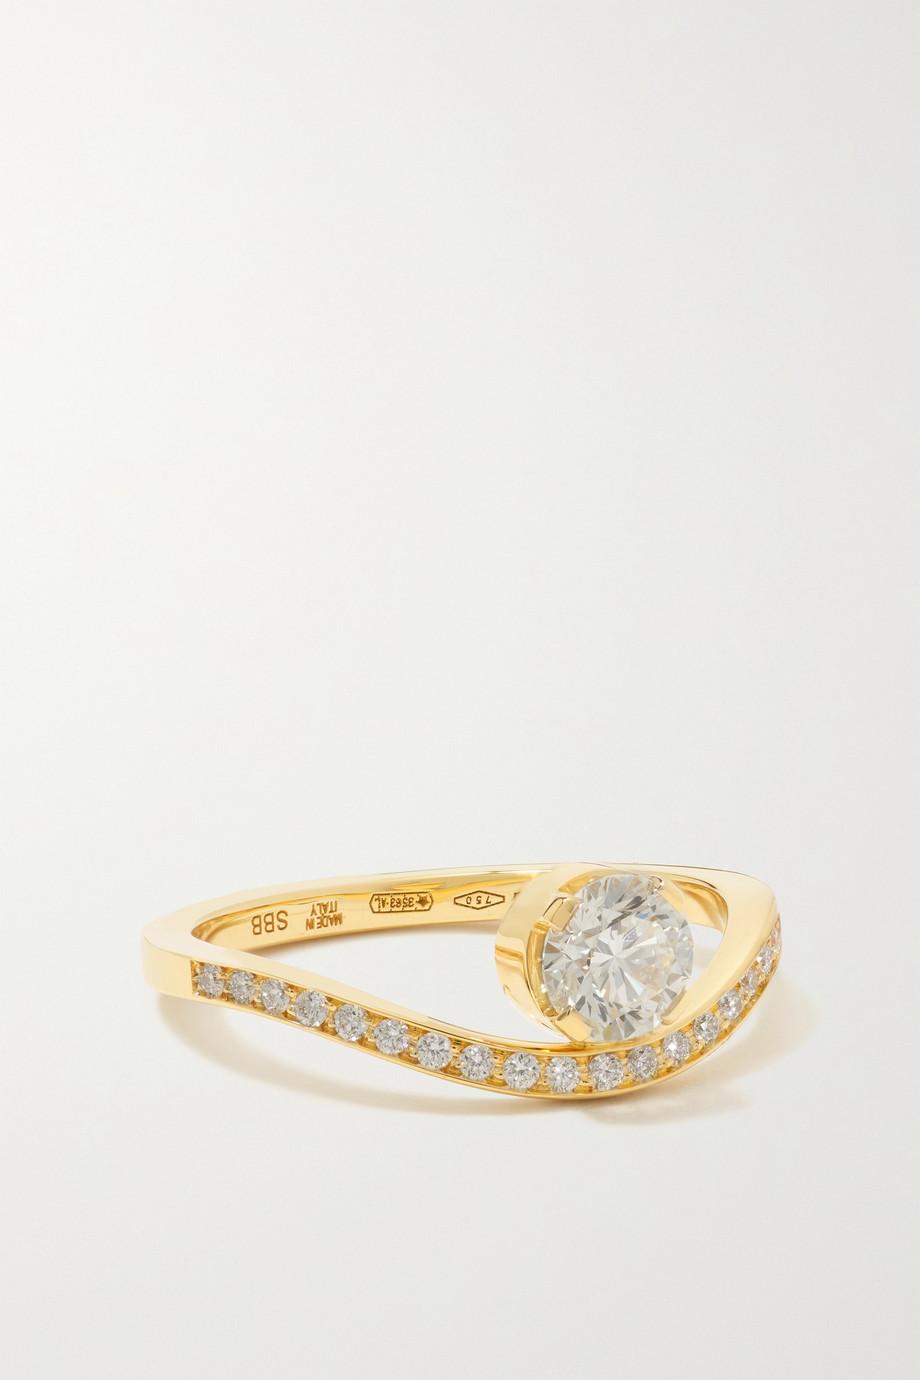 Sophie Bille Brahe Grace Royale 18-karat gold diamond ring